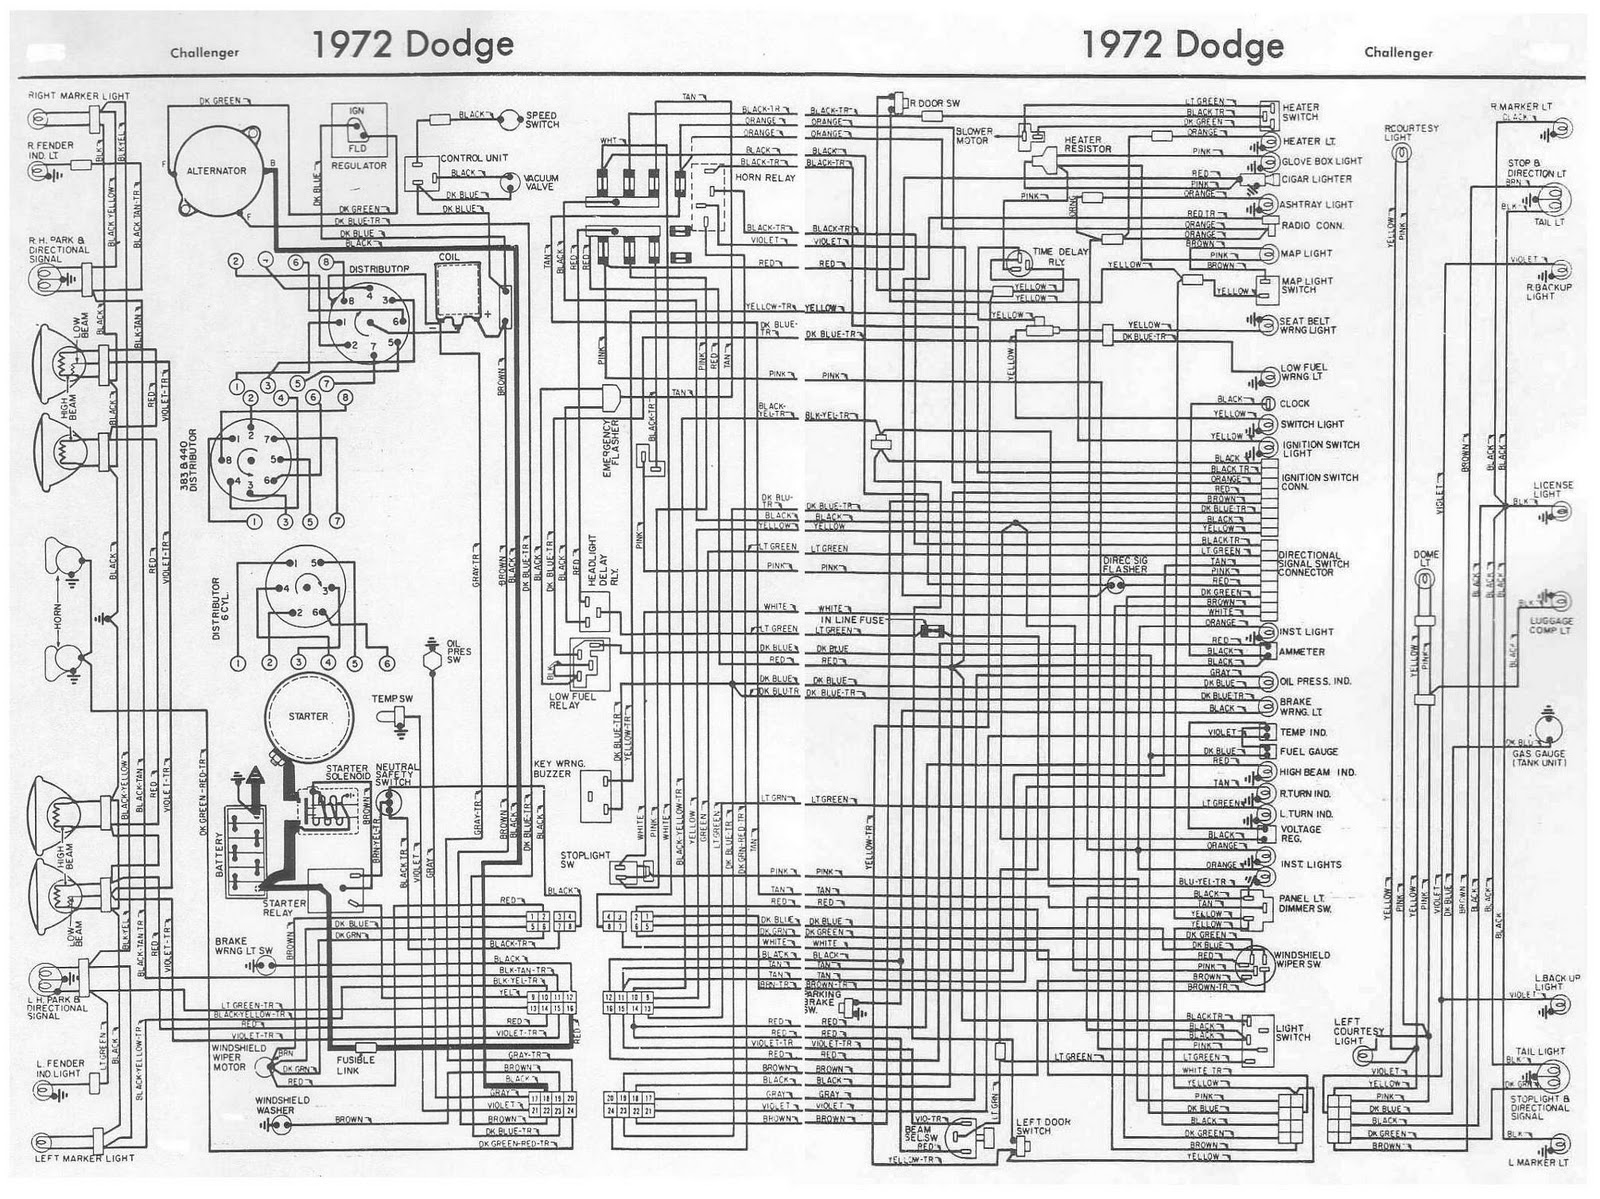 2011 dodge challenger radio wiring diagram detailed schematic diagrams rh 4rmotorsports com Dodge Challenger 5.7 Hemi Engine 1970 challenger engine wiring diagram